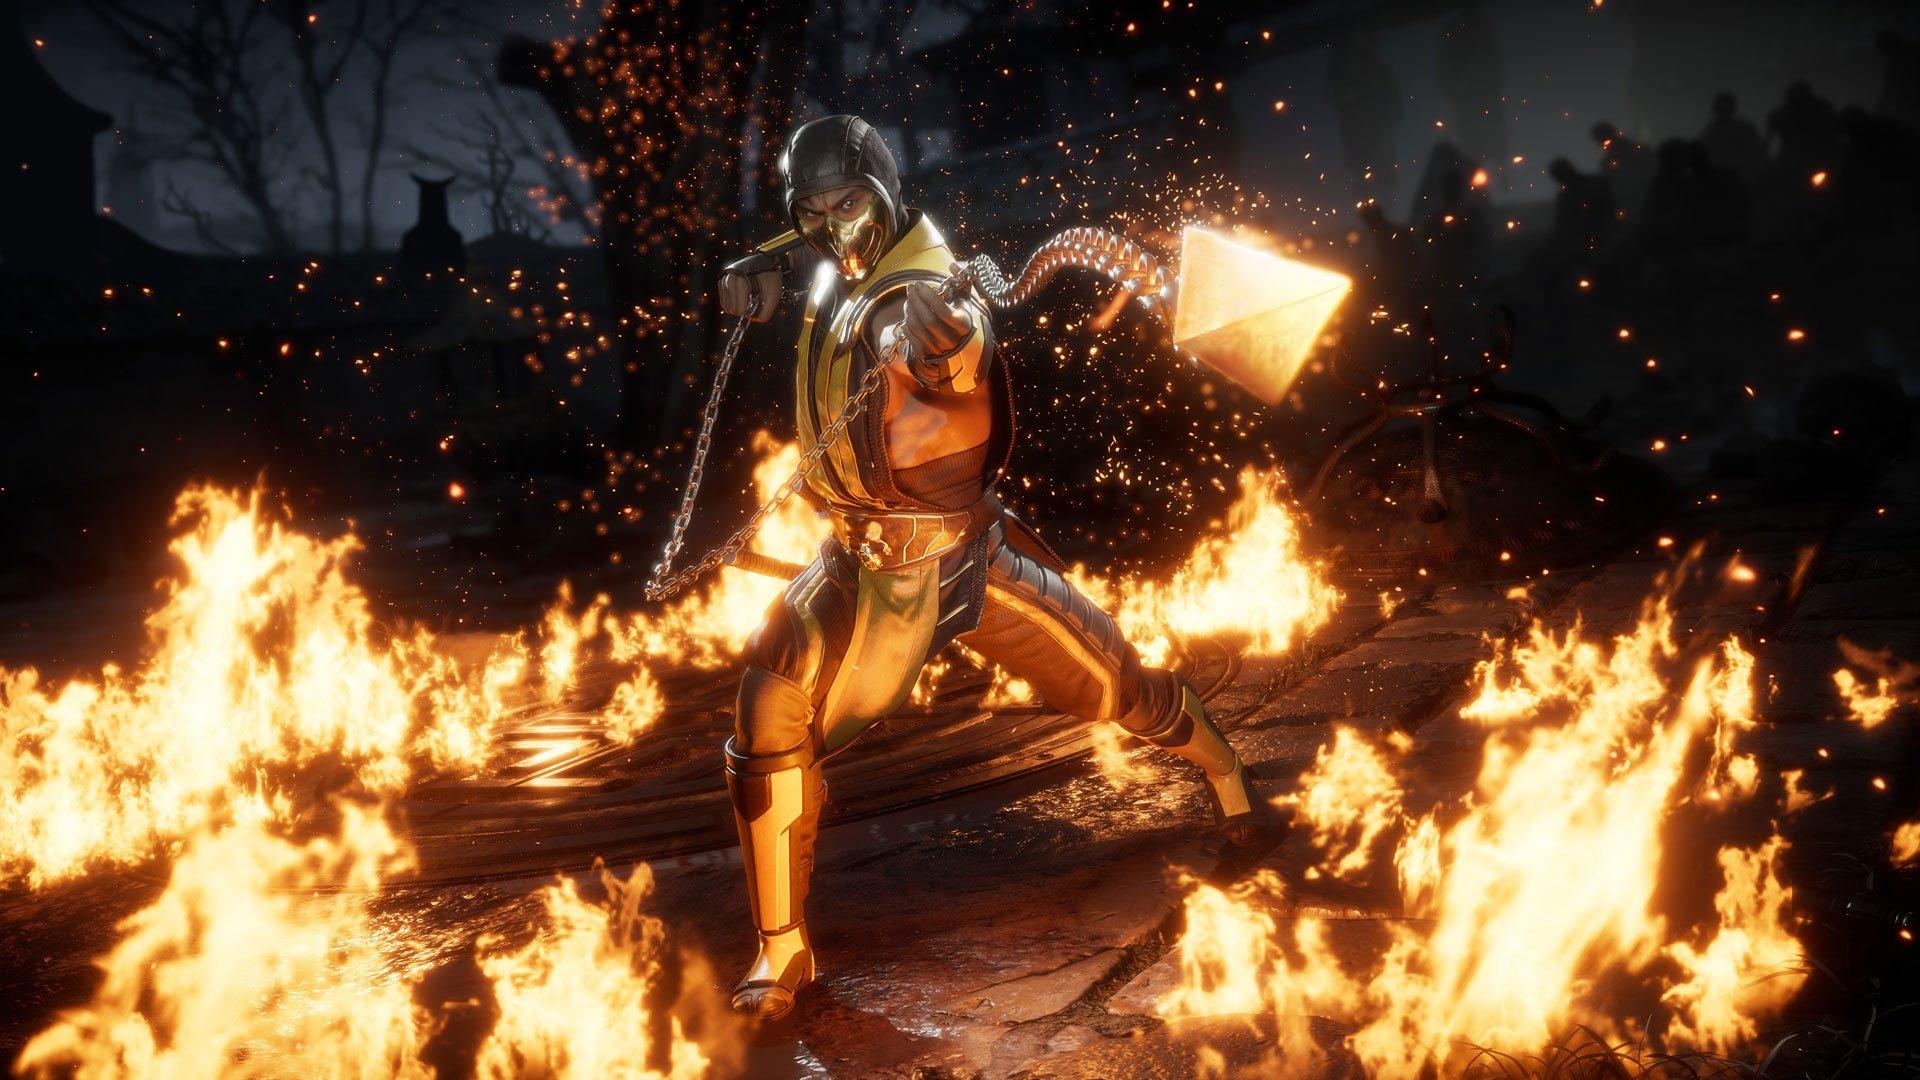 Mortal Kombat 11 Scorpion The Game Awards 2018 Hd